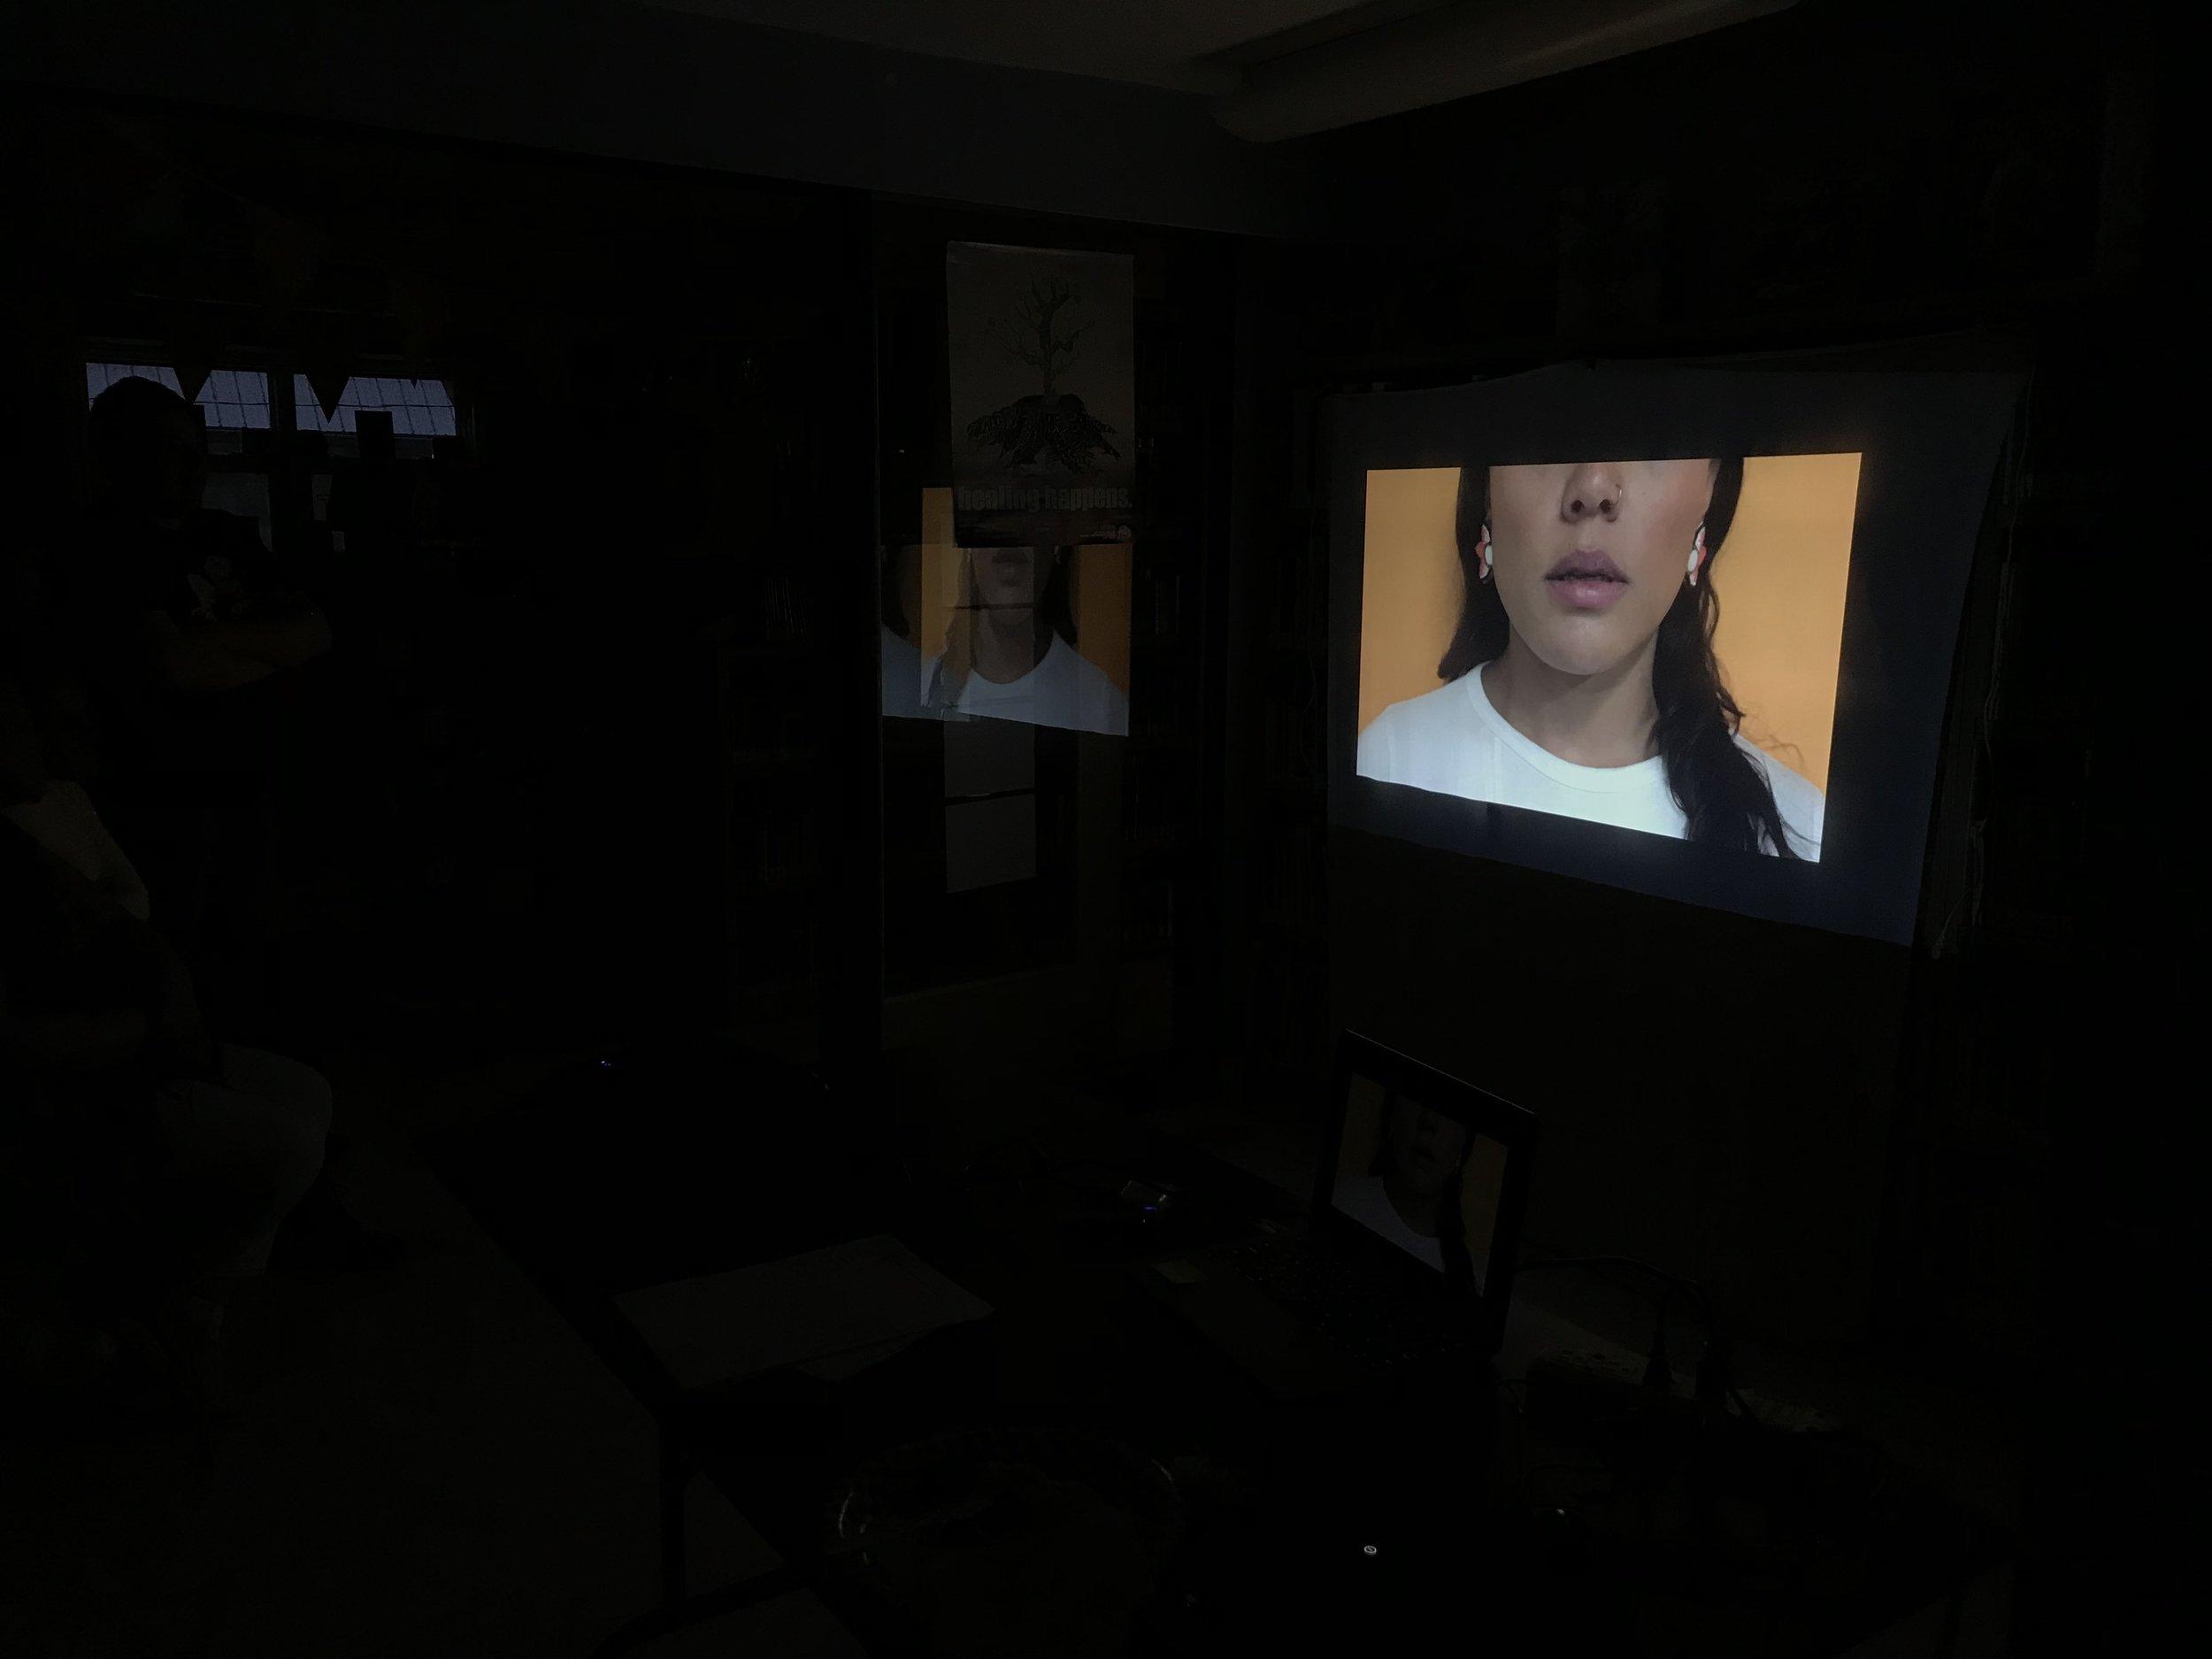 Brooke's film